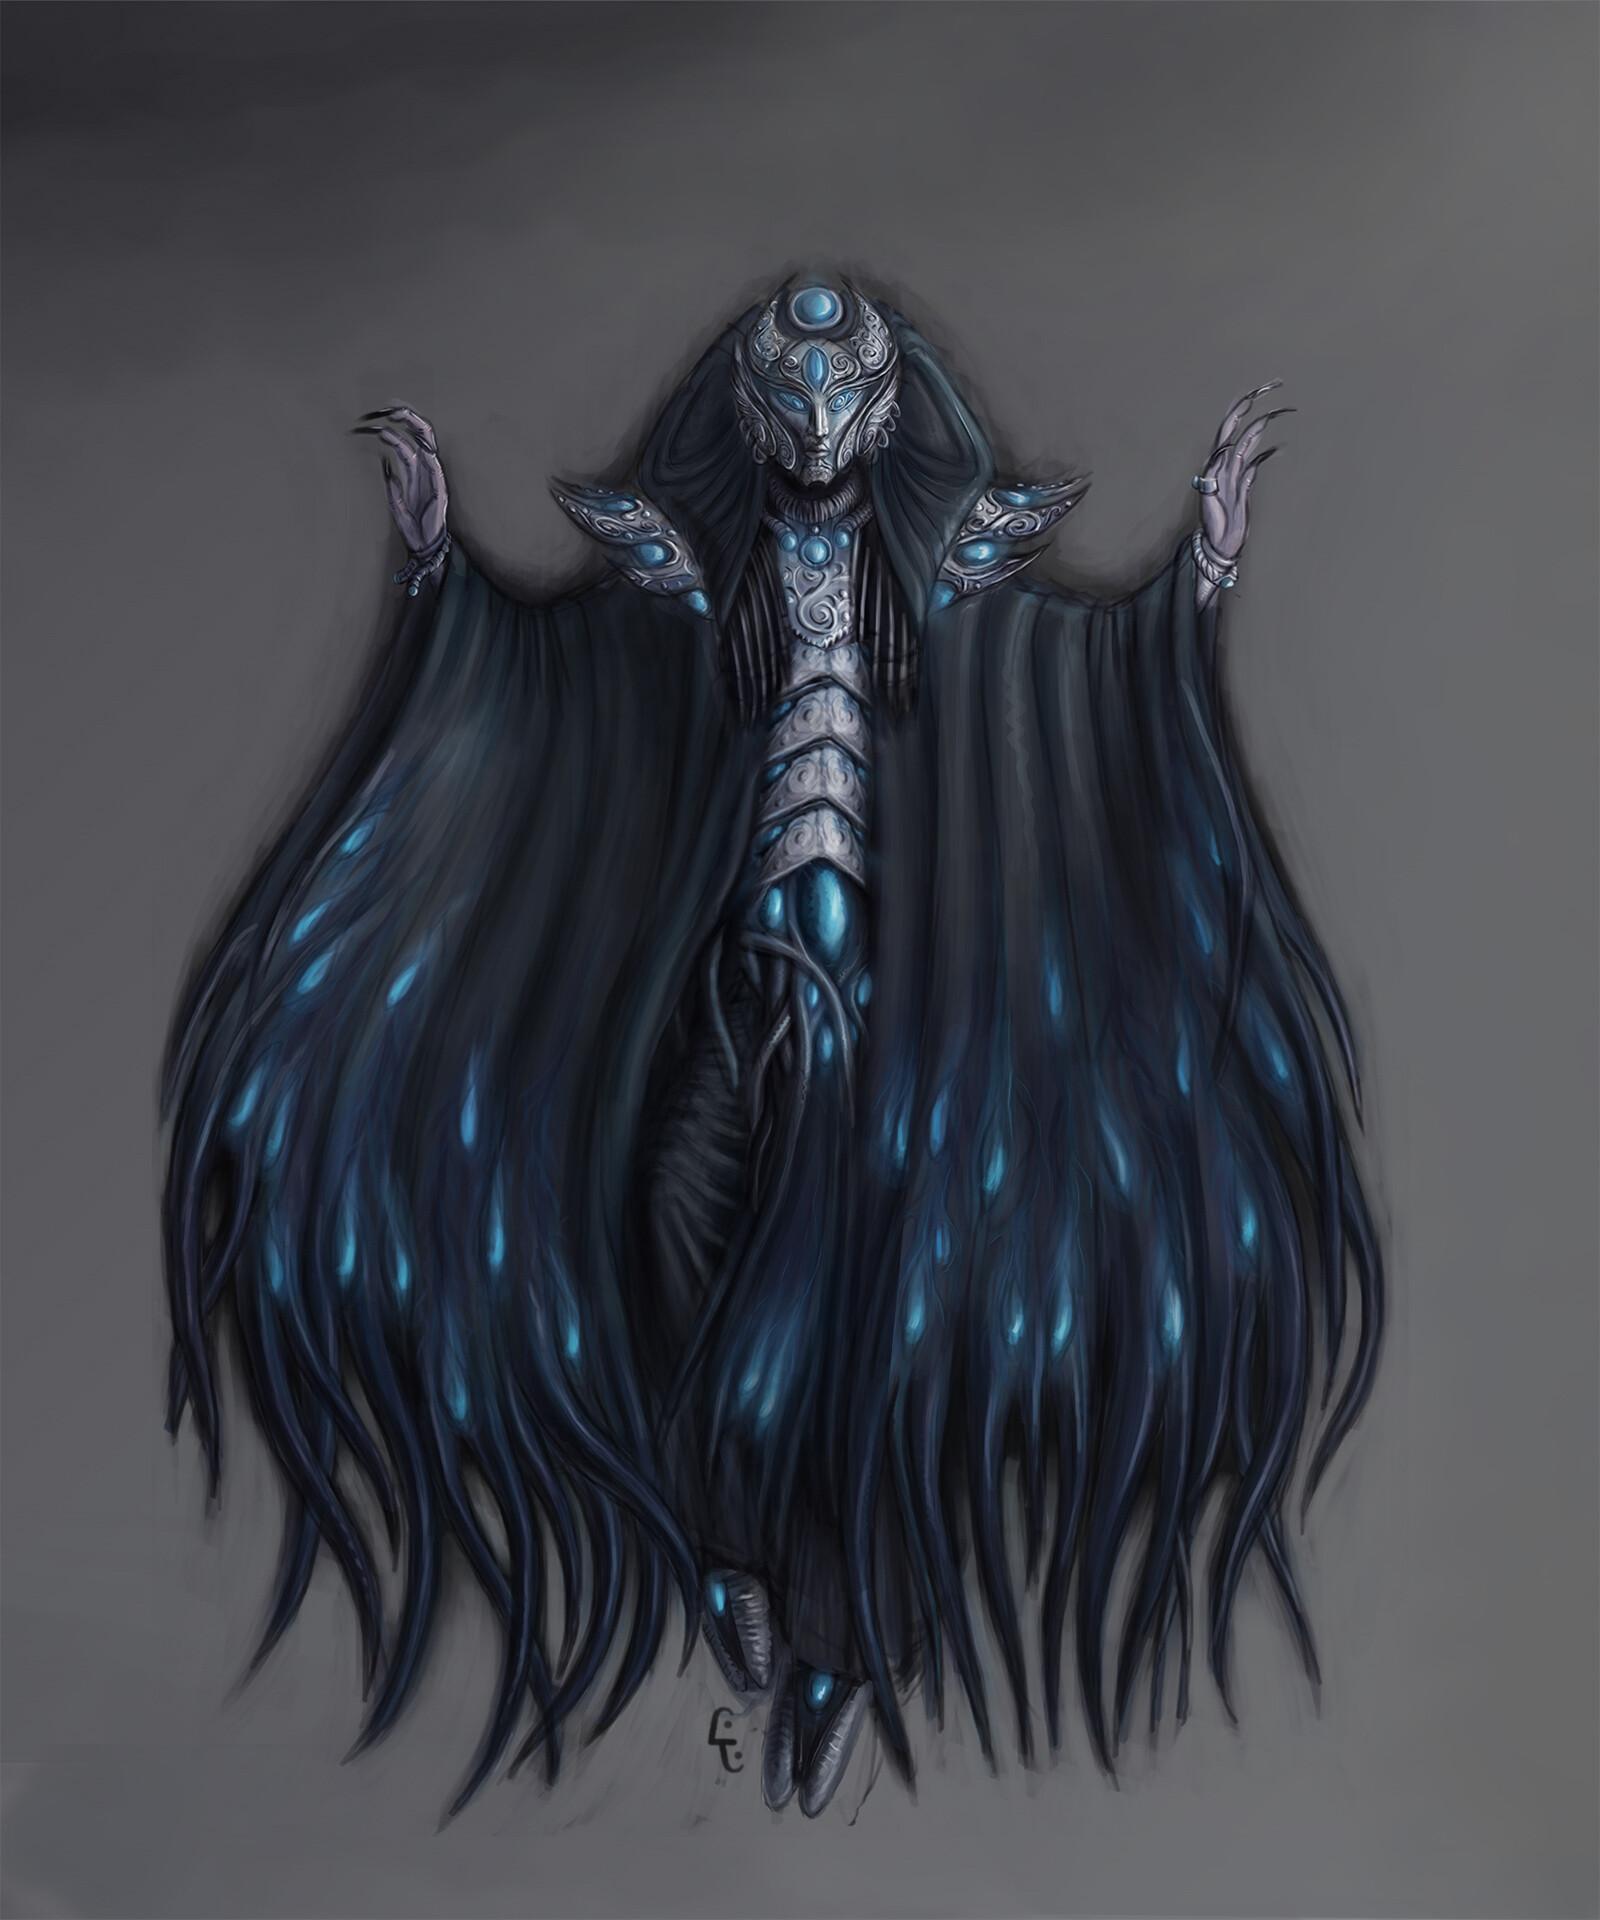 Luka trkanjec 1 black archon